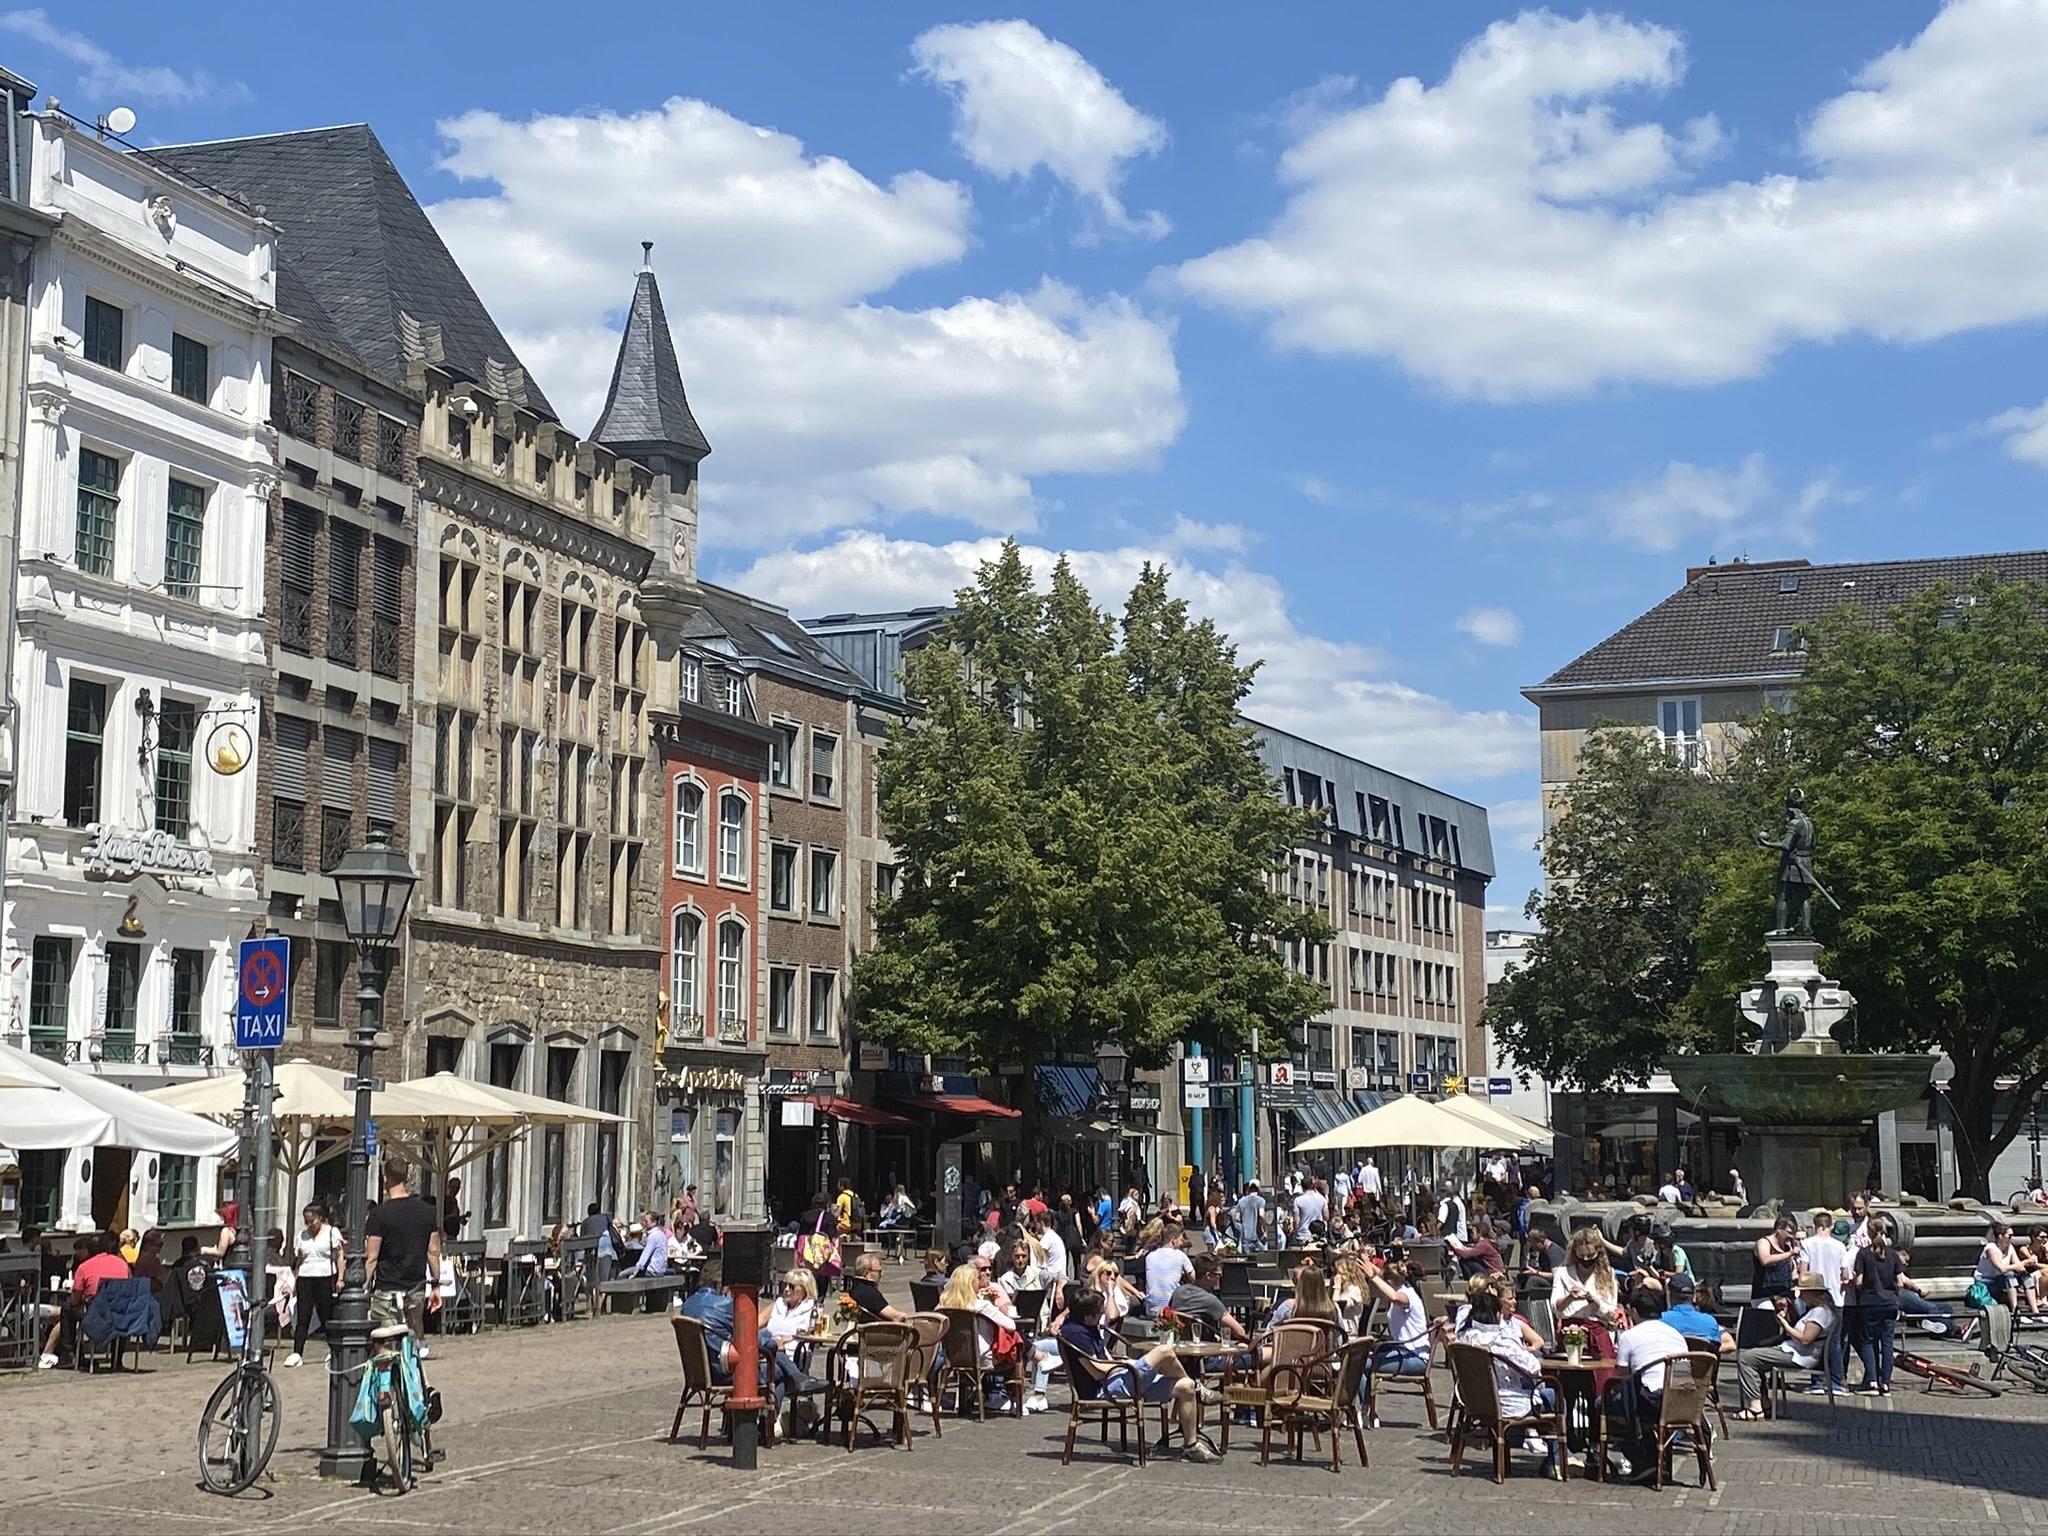 Finally, travel again! Little tour across the Netherlands